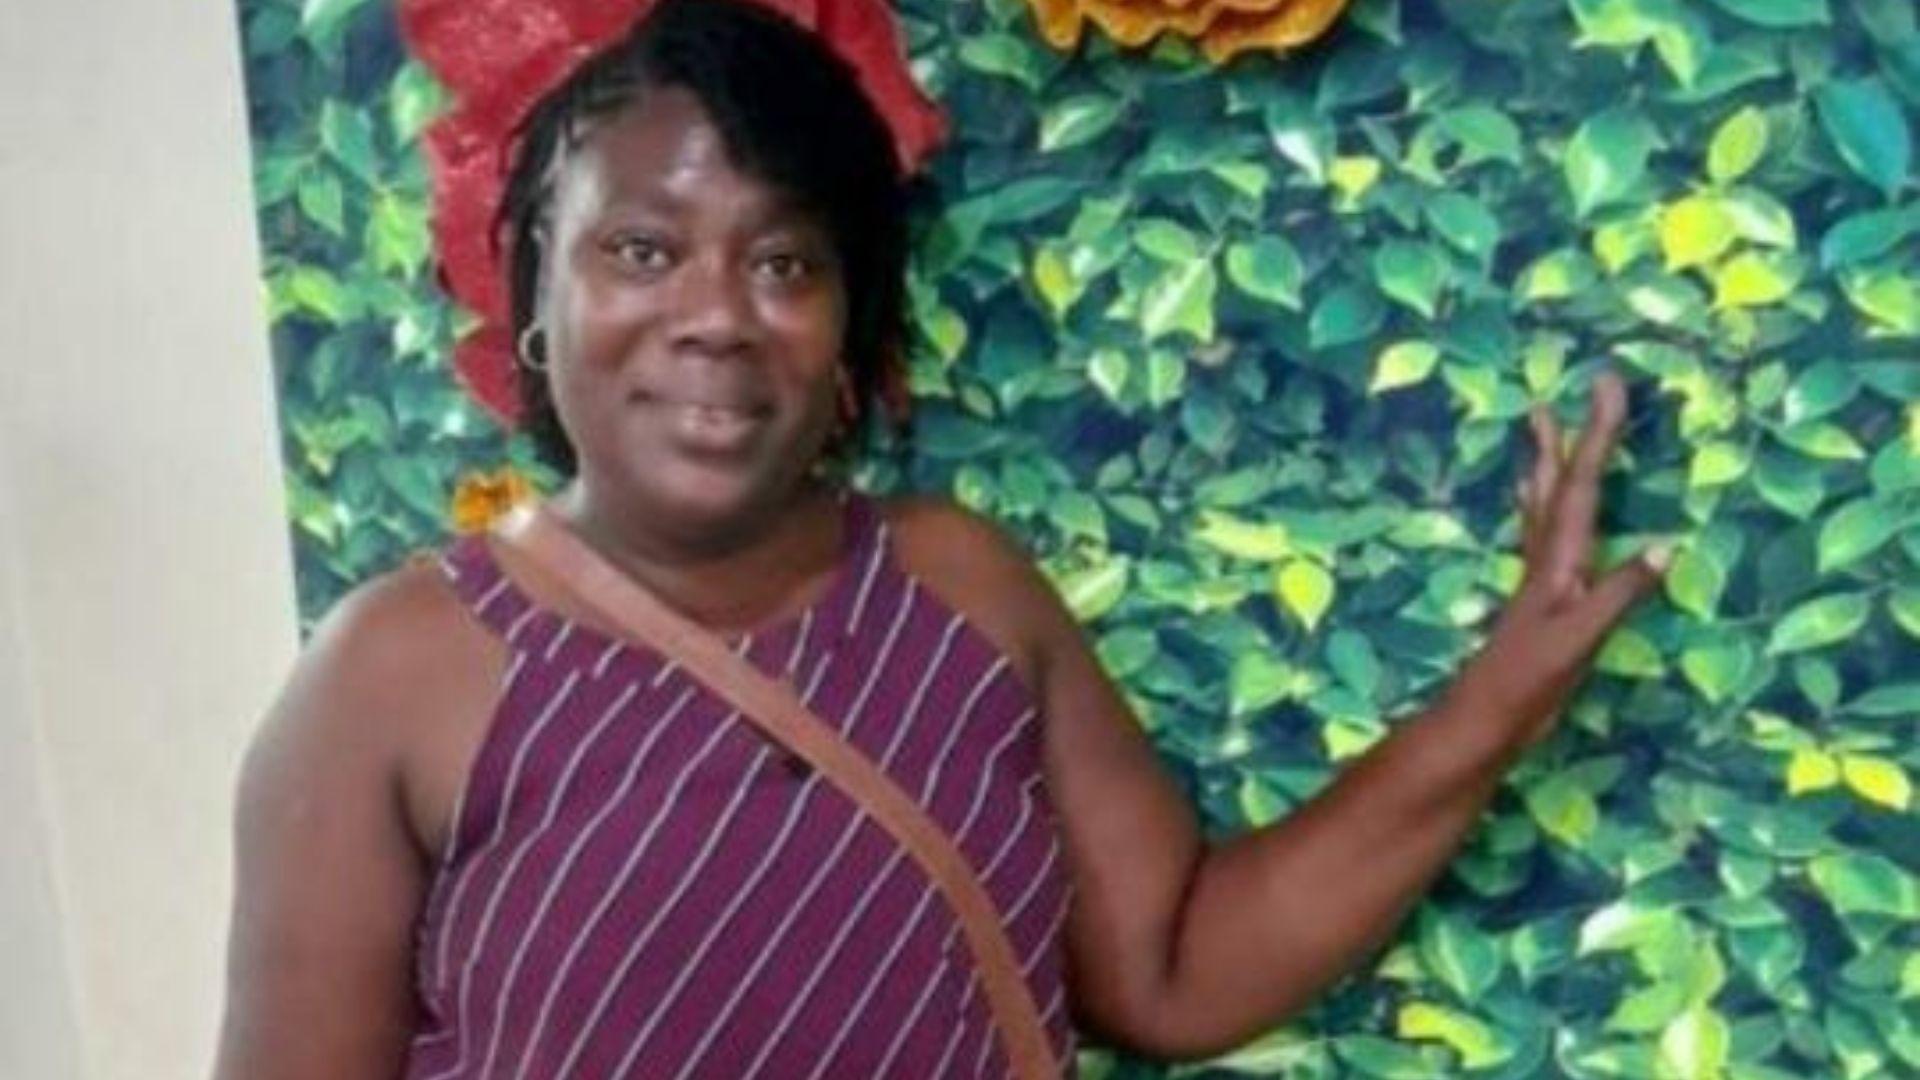 Million-dollar reward for teacher's safe return